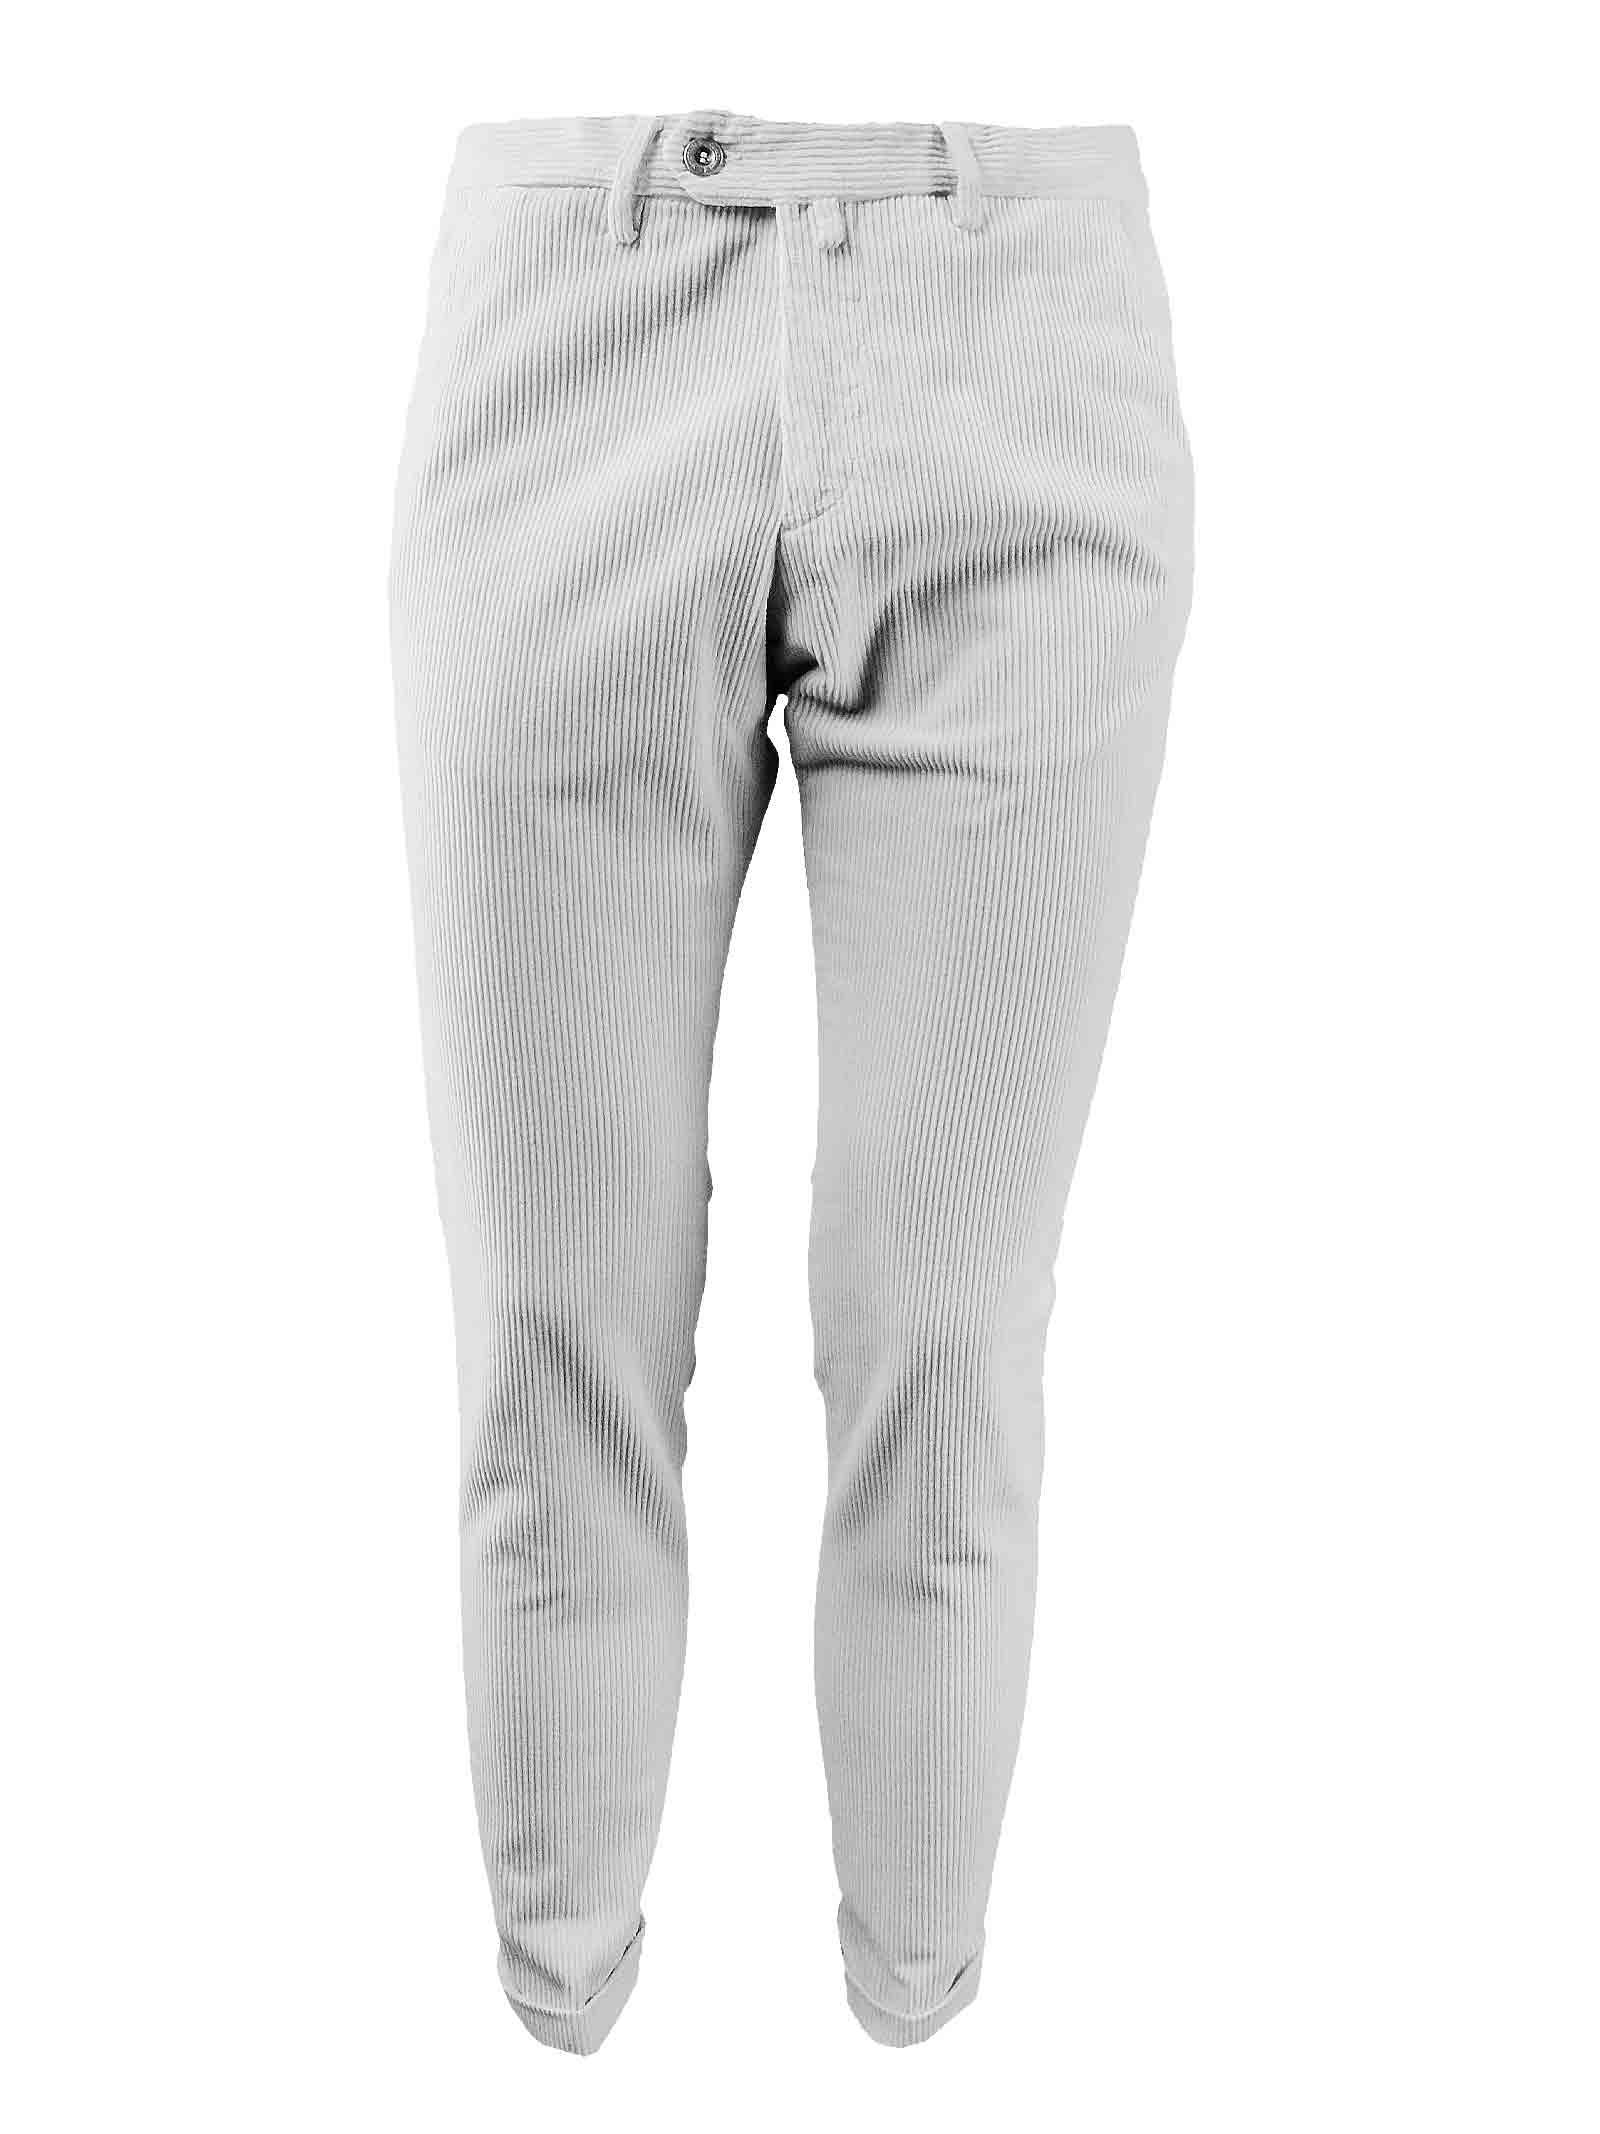 B700 | Trousers | MH700 800603